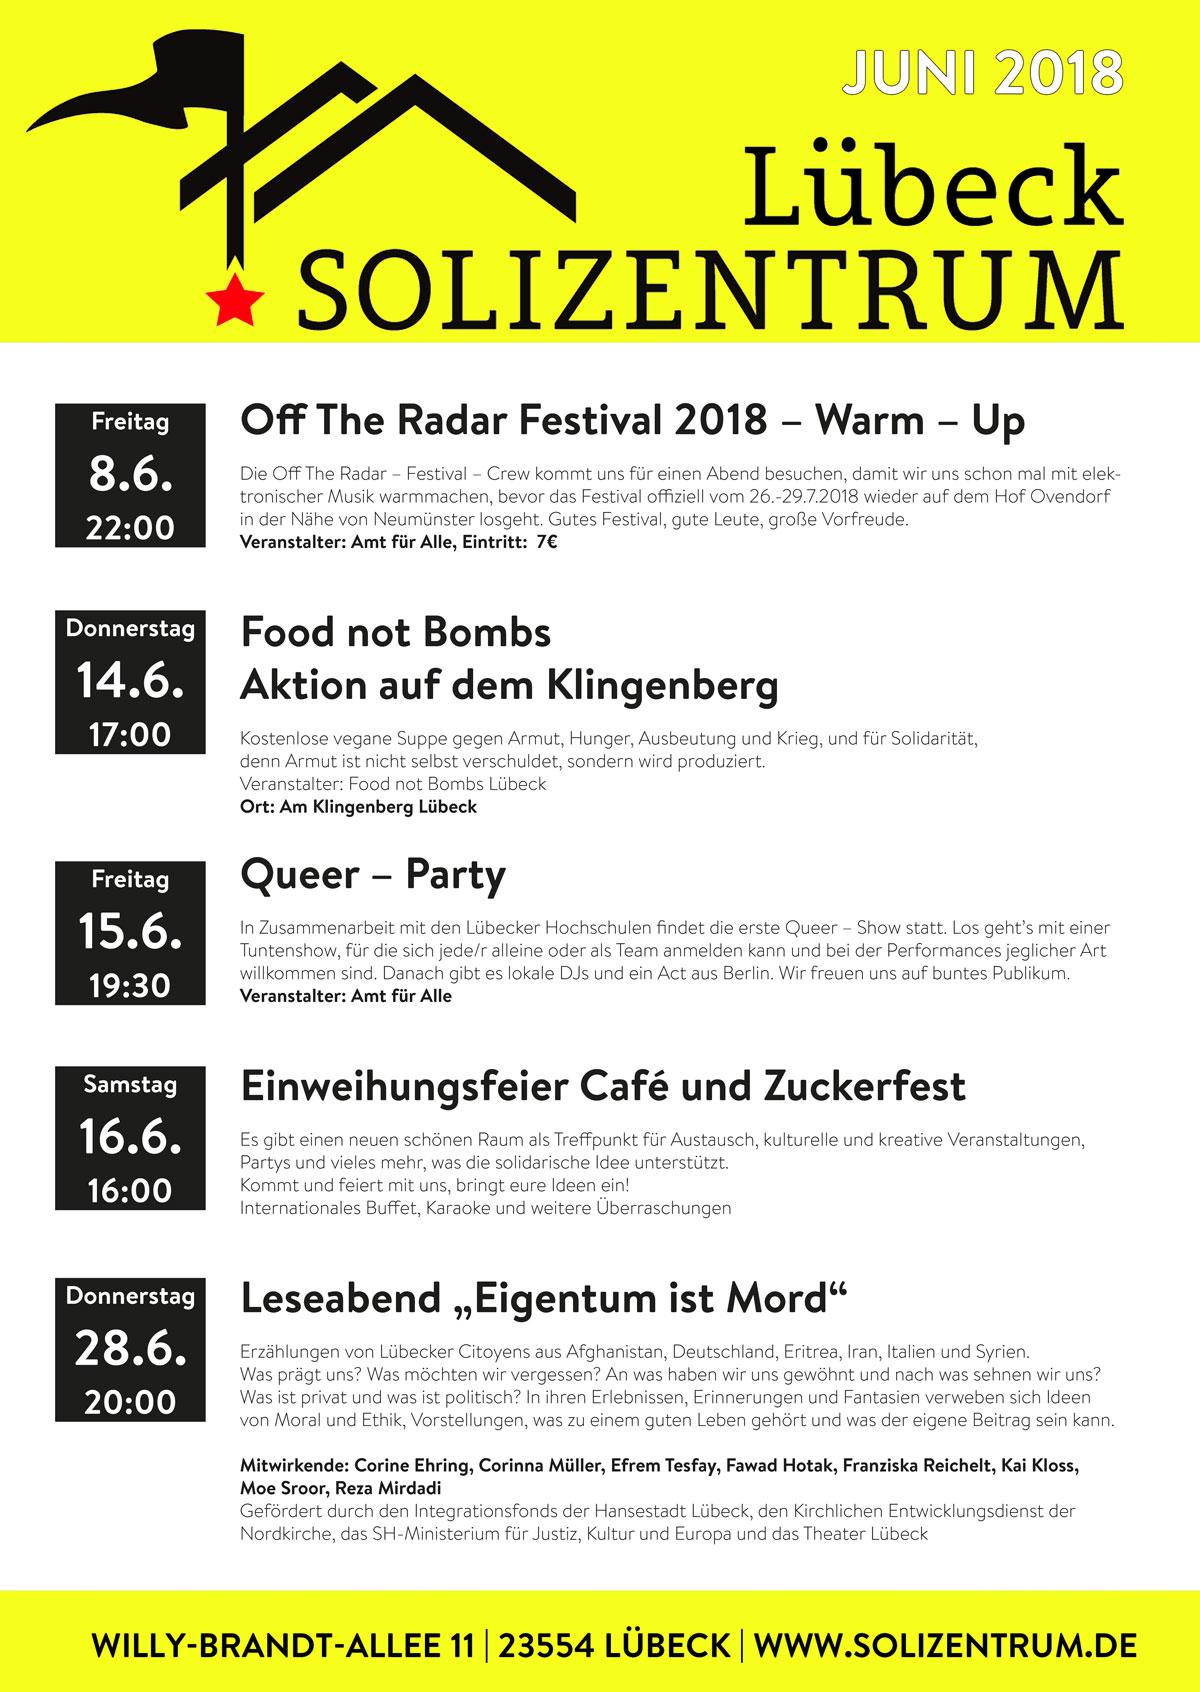 Großartig Sehnen Küche Und Bar Ideen - Küchen Ideen Modern ...